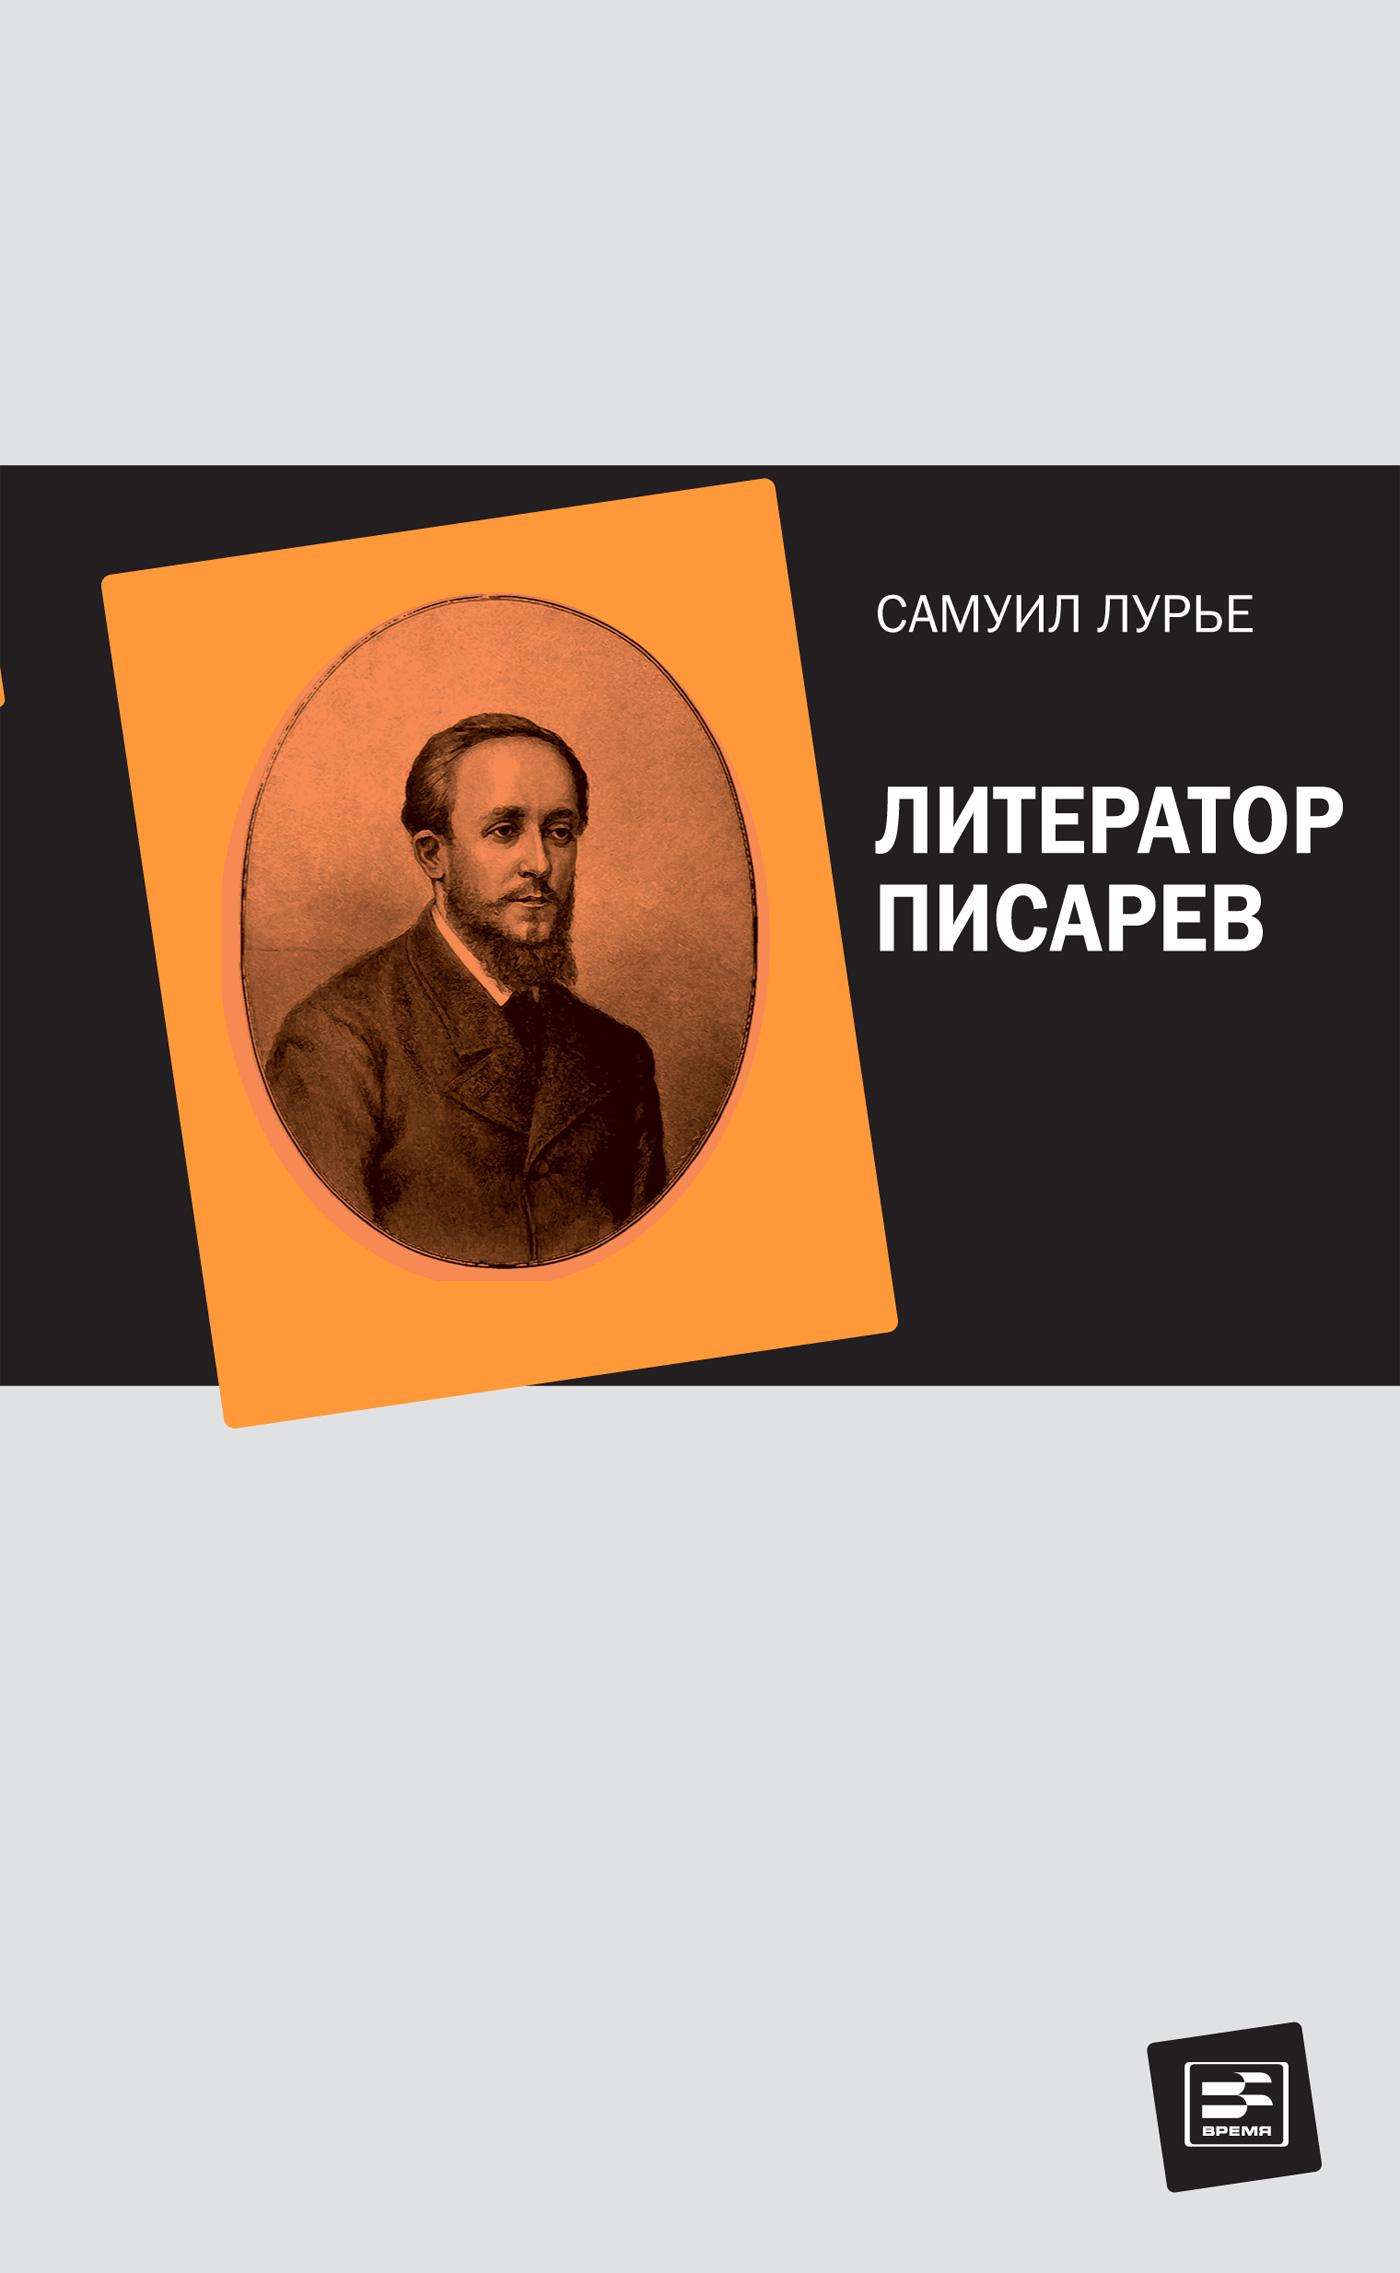 Самуил Лурье Литератор Писарев самуил лурье литератор писарев